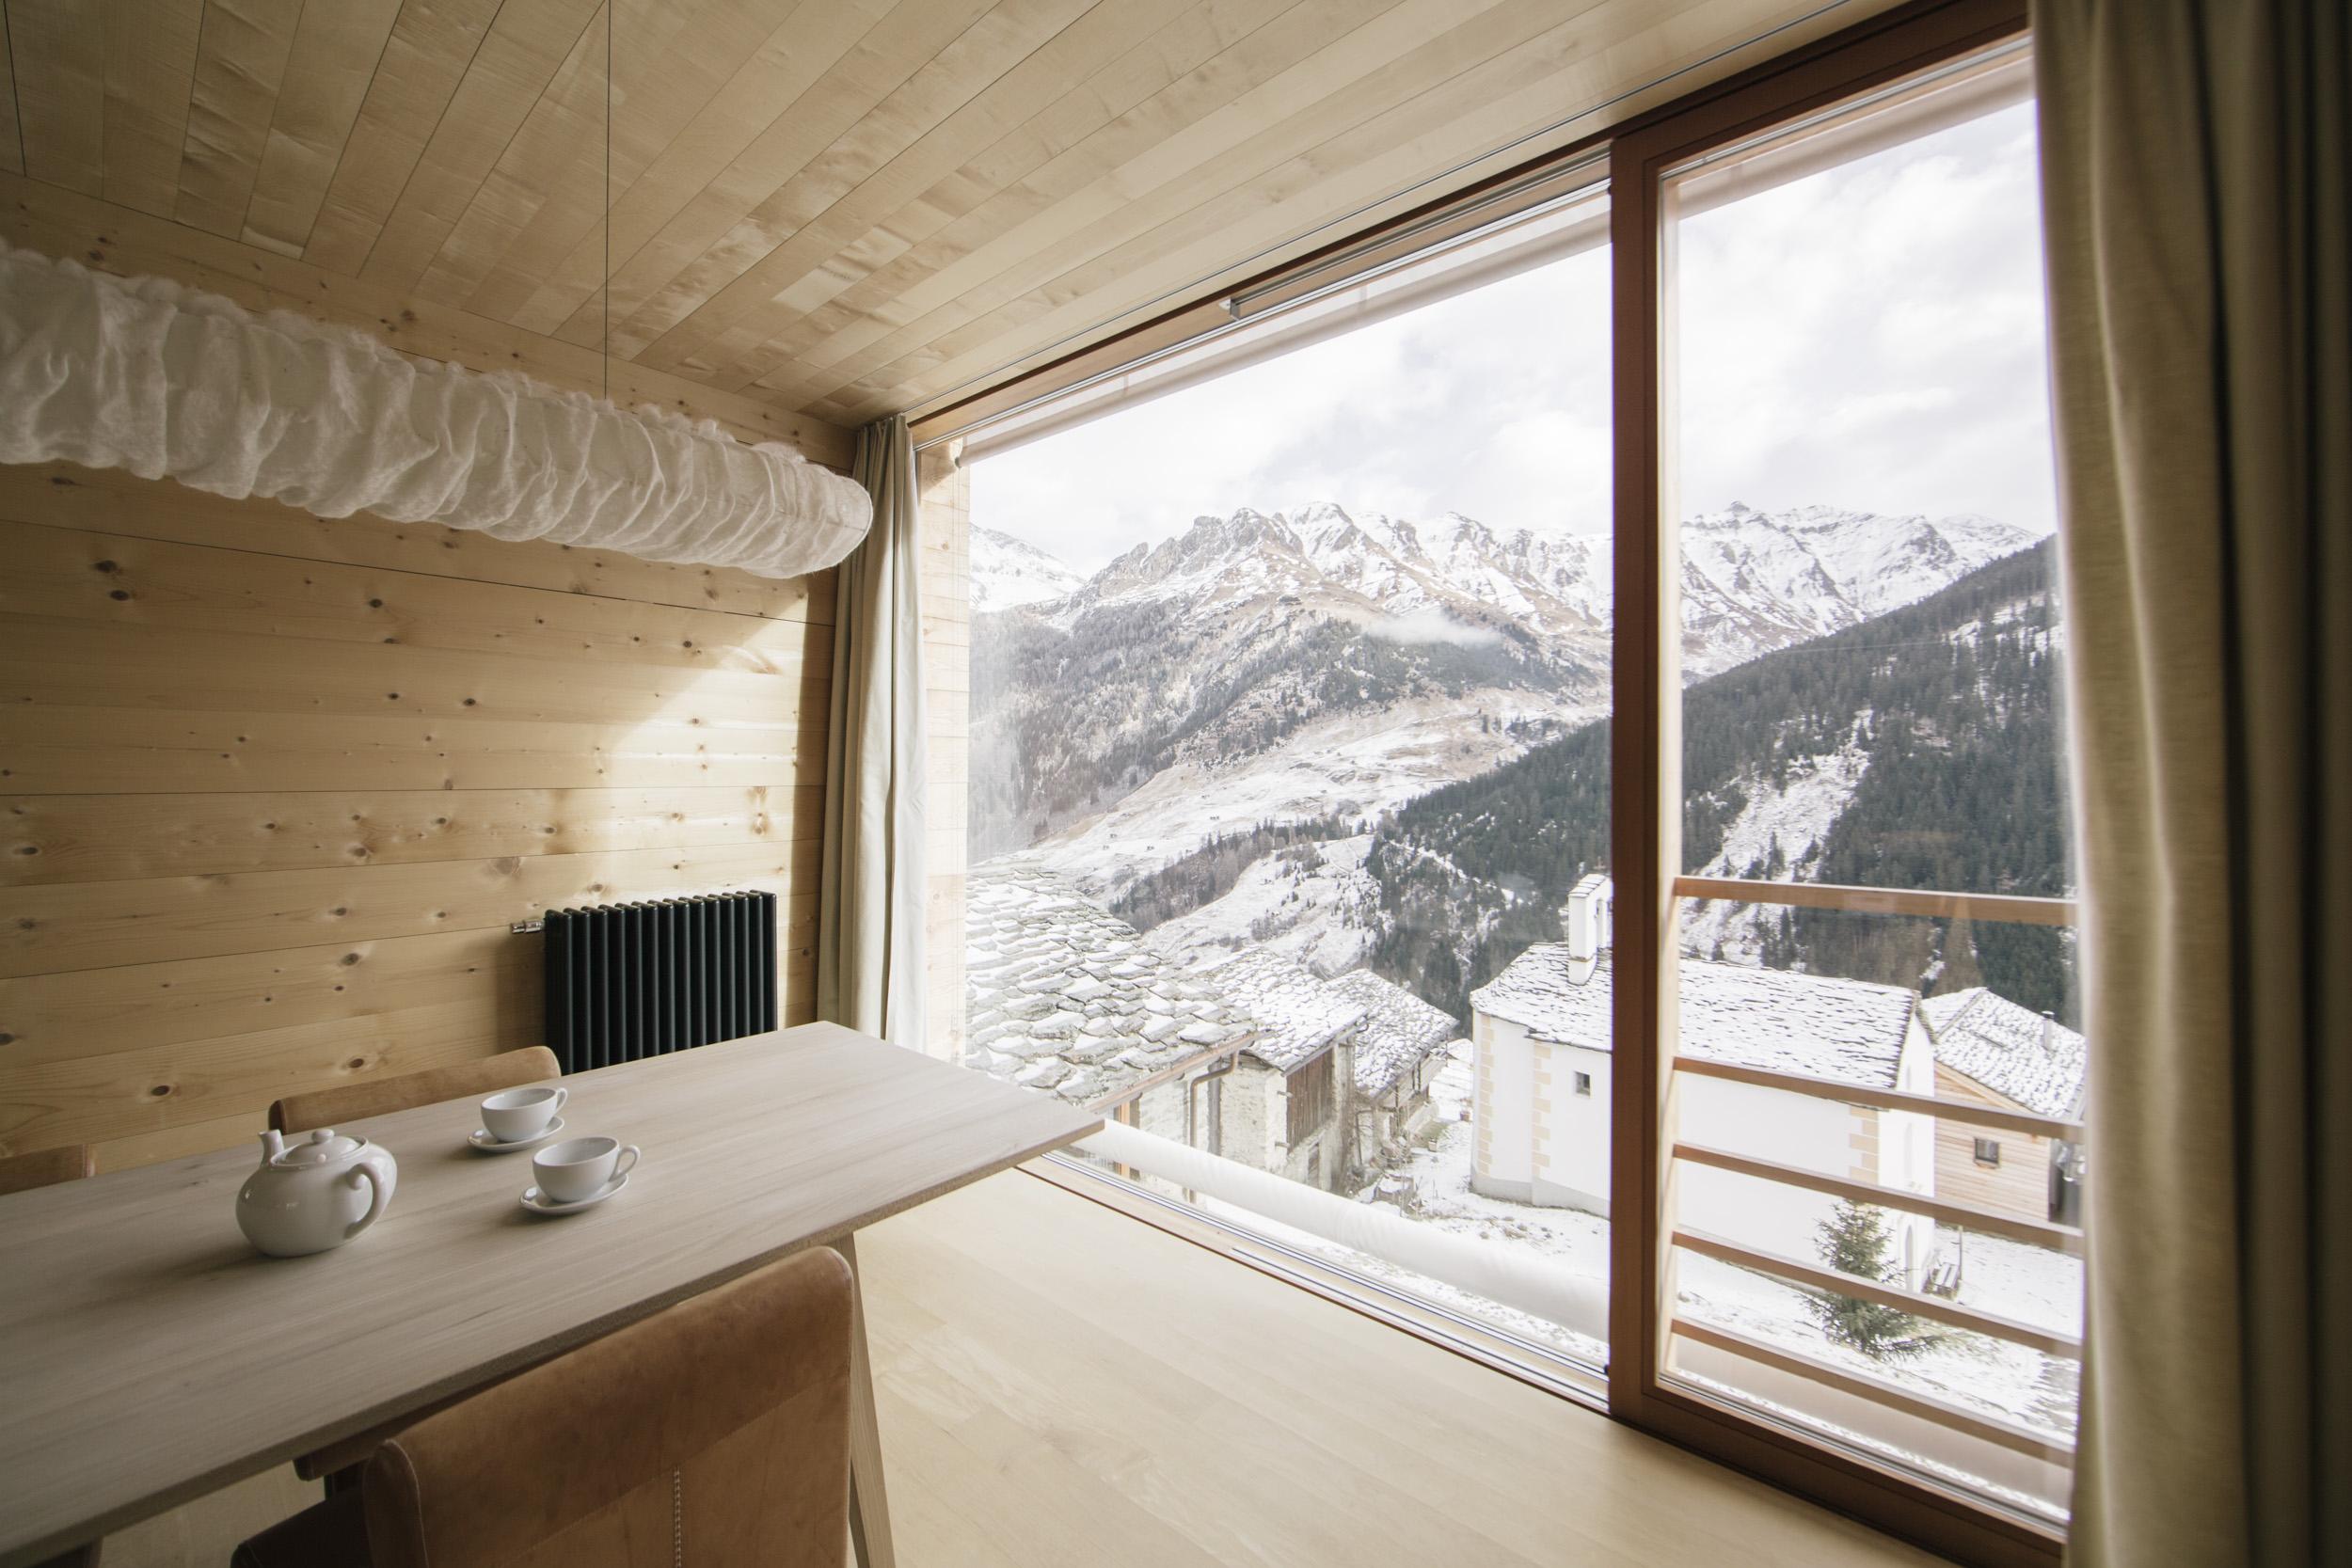 ZUMTHOR VACATION HOMES - Leis, Switzerland